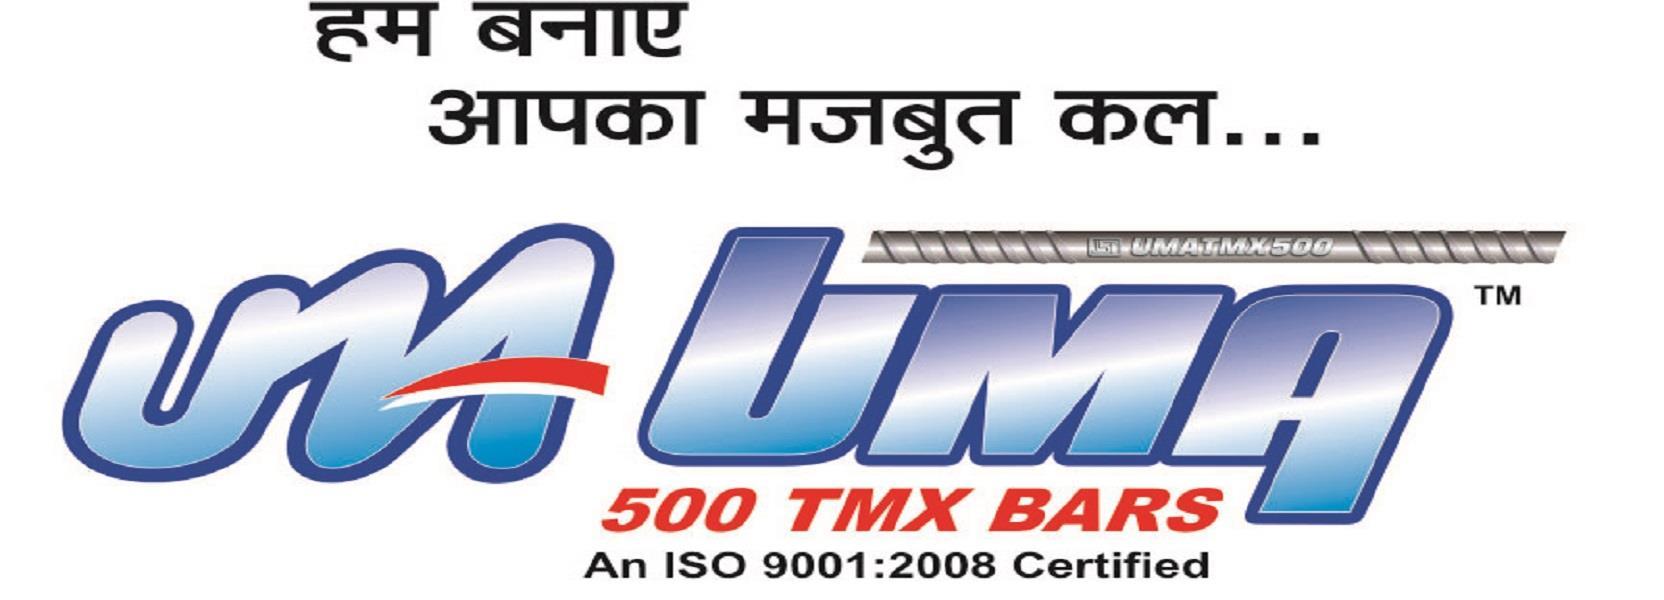 turersTMT Bar ManufacturersUma Steel Manufacturer of TMT Bar TMT Bar Manufacturer of Omasairam Steel